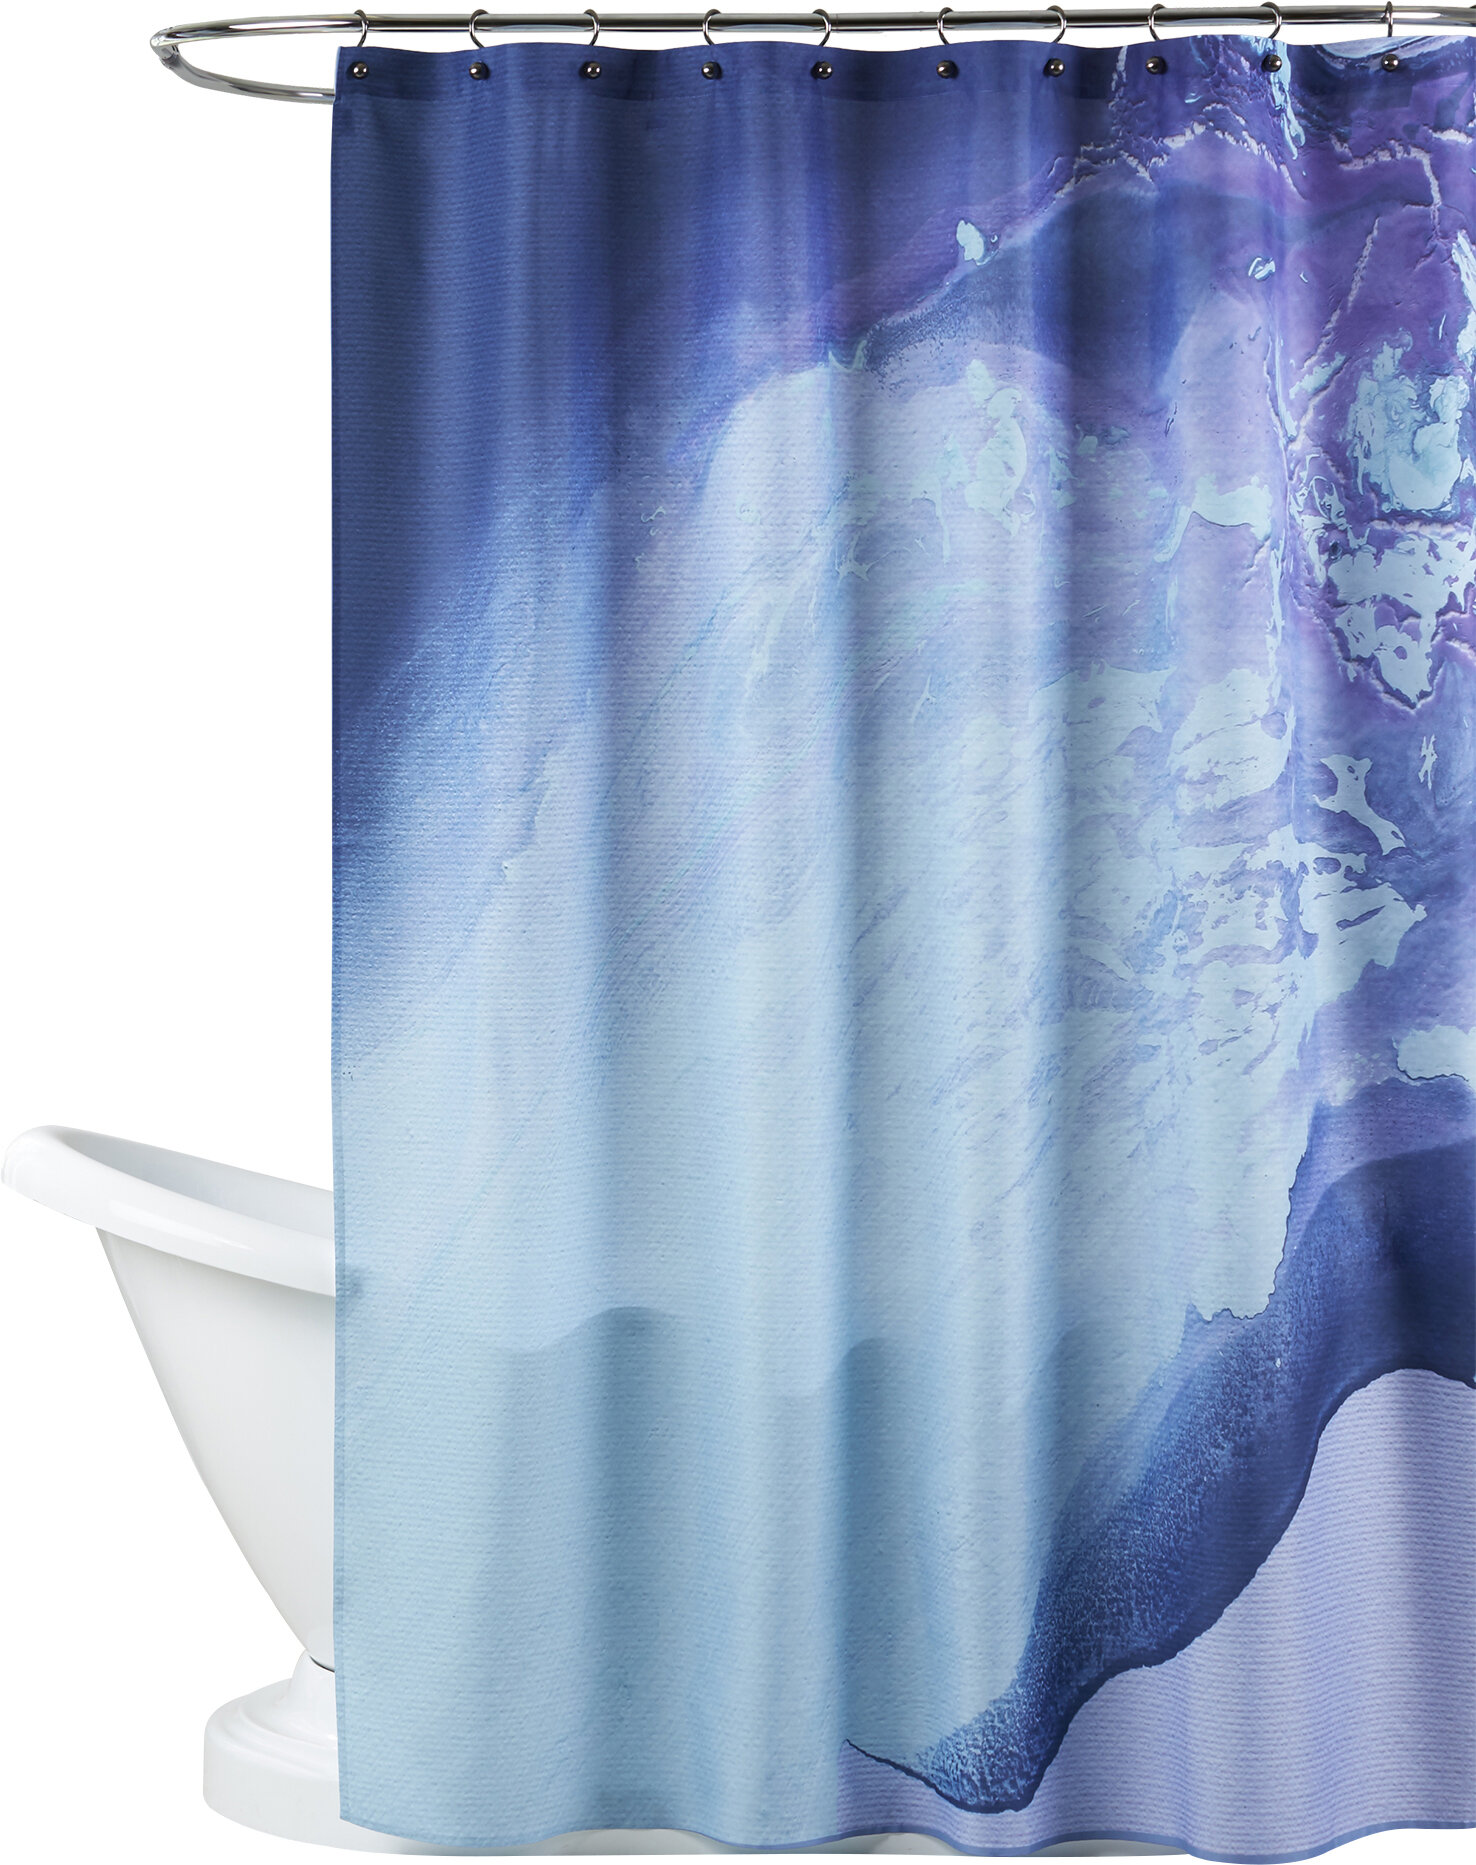 Brayden Studio Deb Mcnaughton Cool Single Shower Curtain Wayfair